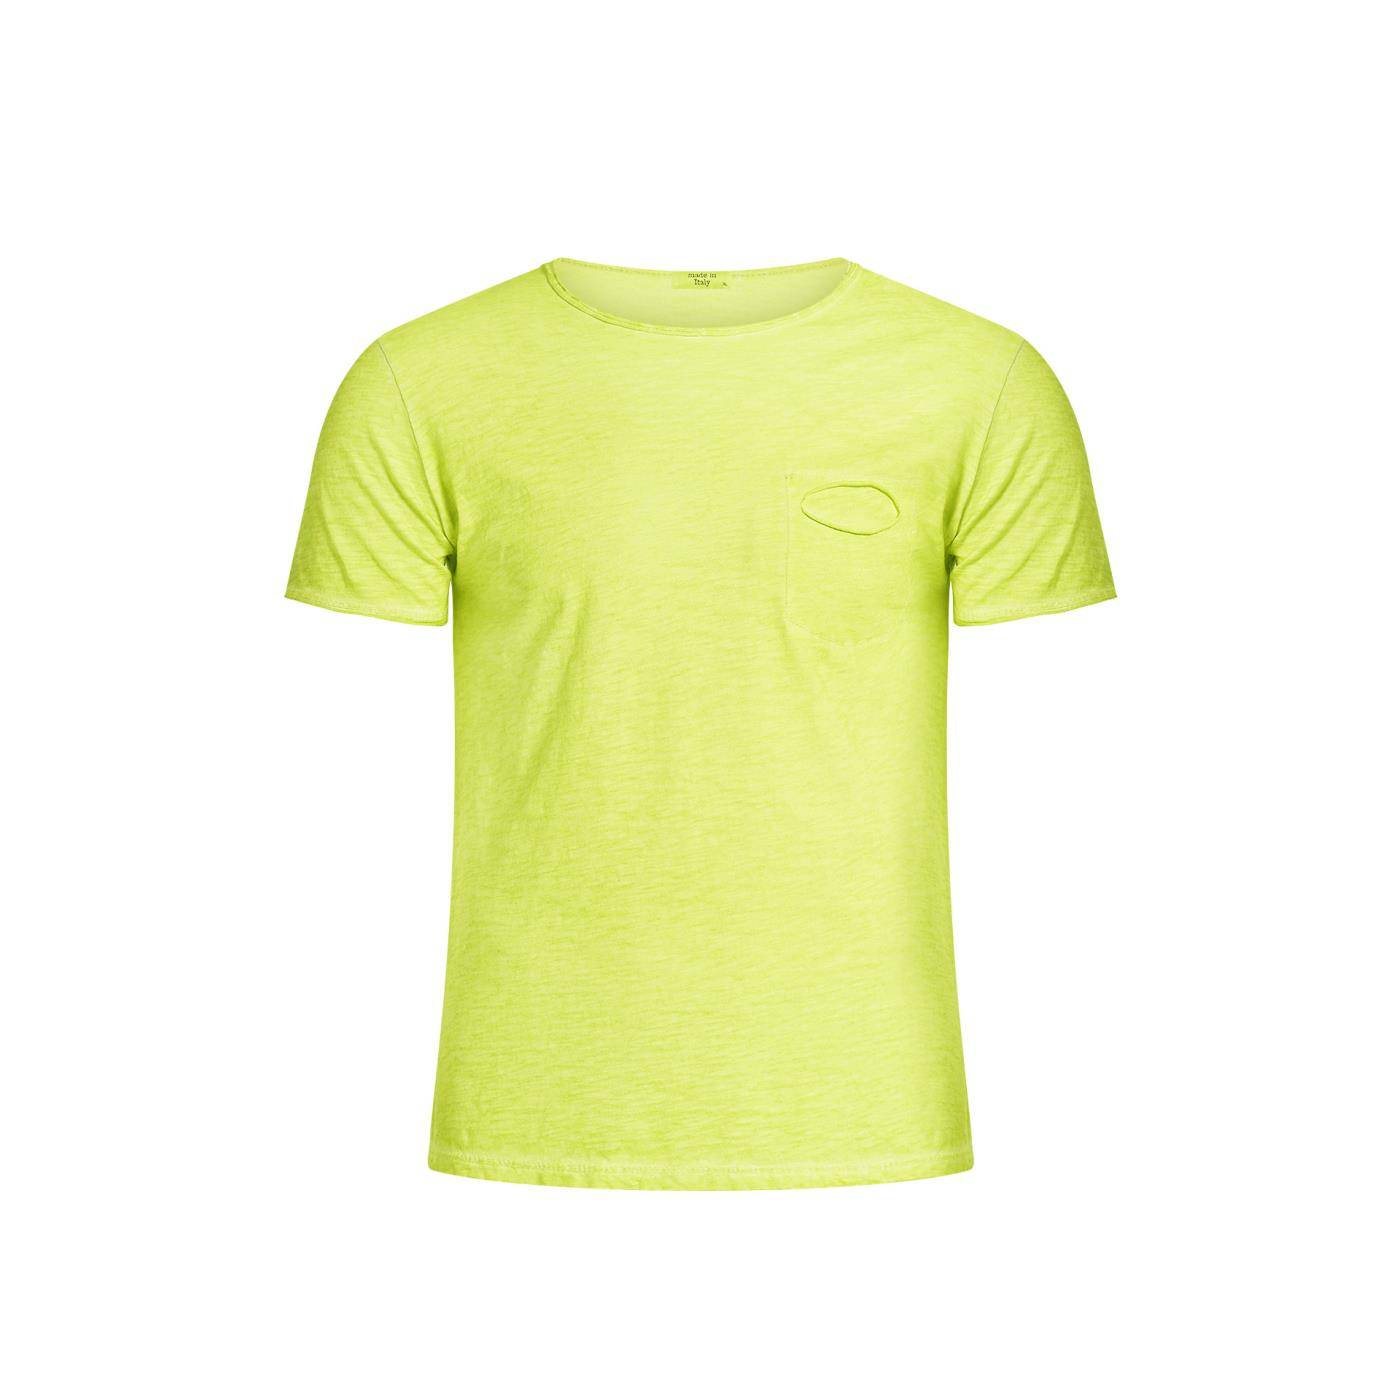 Celestino Ανδρική βαμβακερή μπλούζα με τσέπη  - Φλουο κιτρινο - Grootte: Small